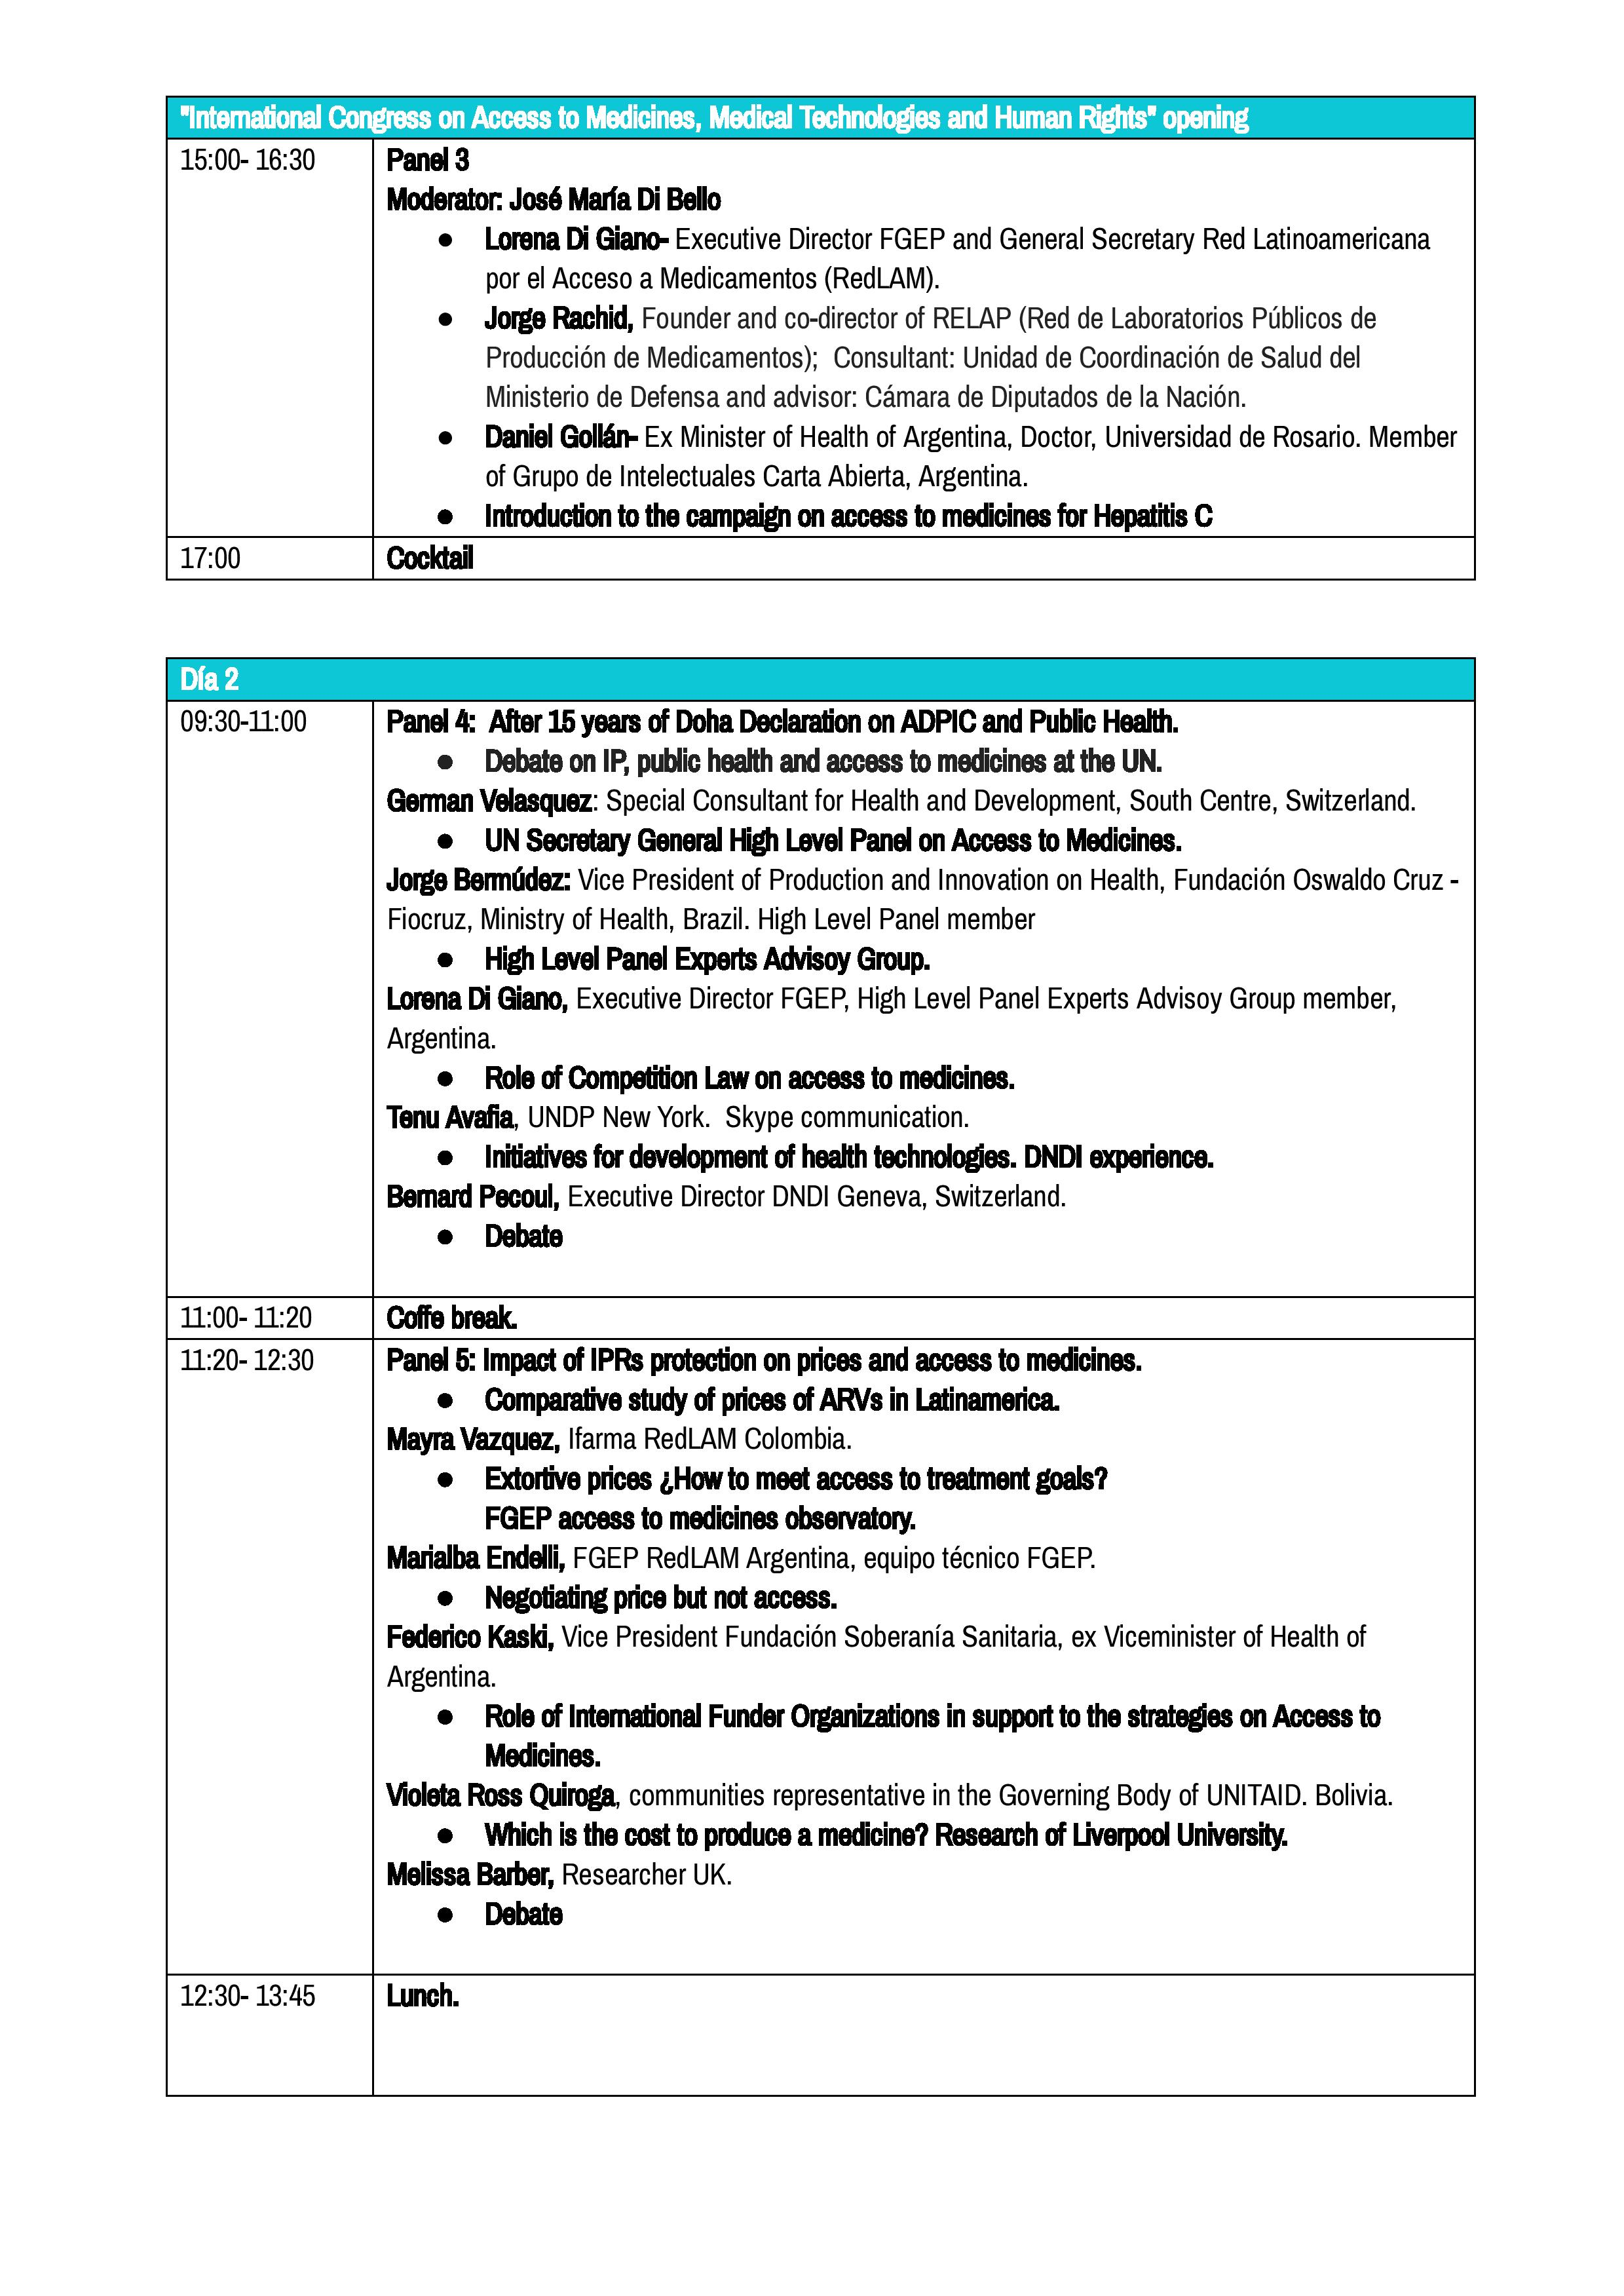 final-agenda-international-congress-print-docx_1479083532315-page-002